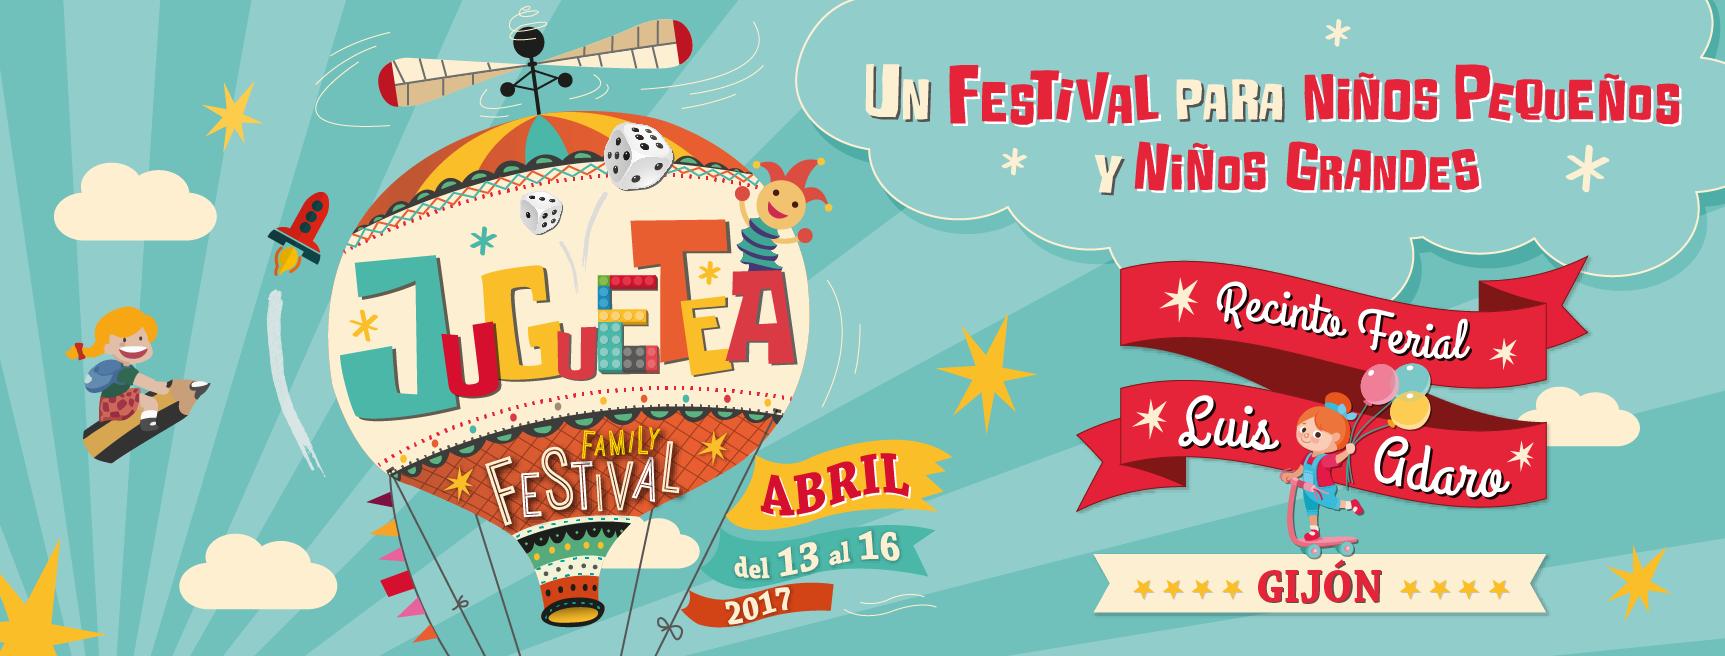 Juguetea Family Festival